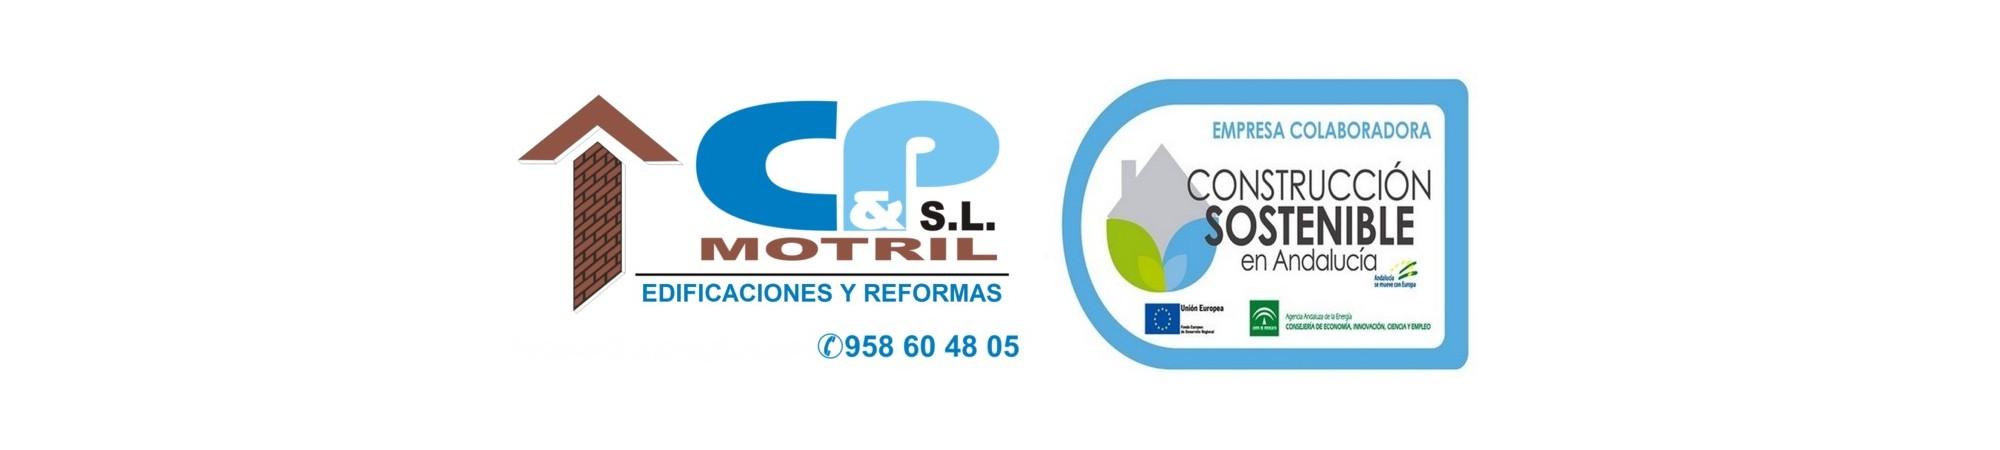 Construcciones Castillo & Pérez  S.L., construcciones en motril, constructores en motril, pisos